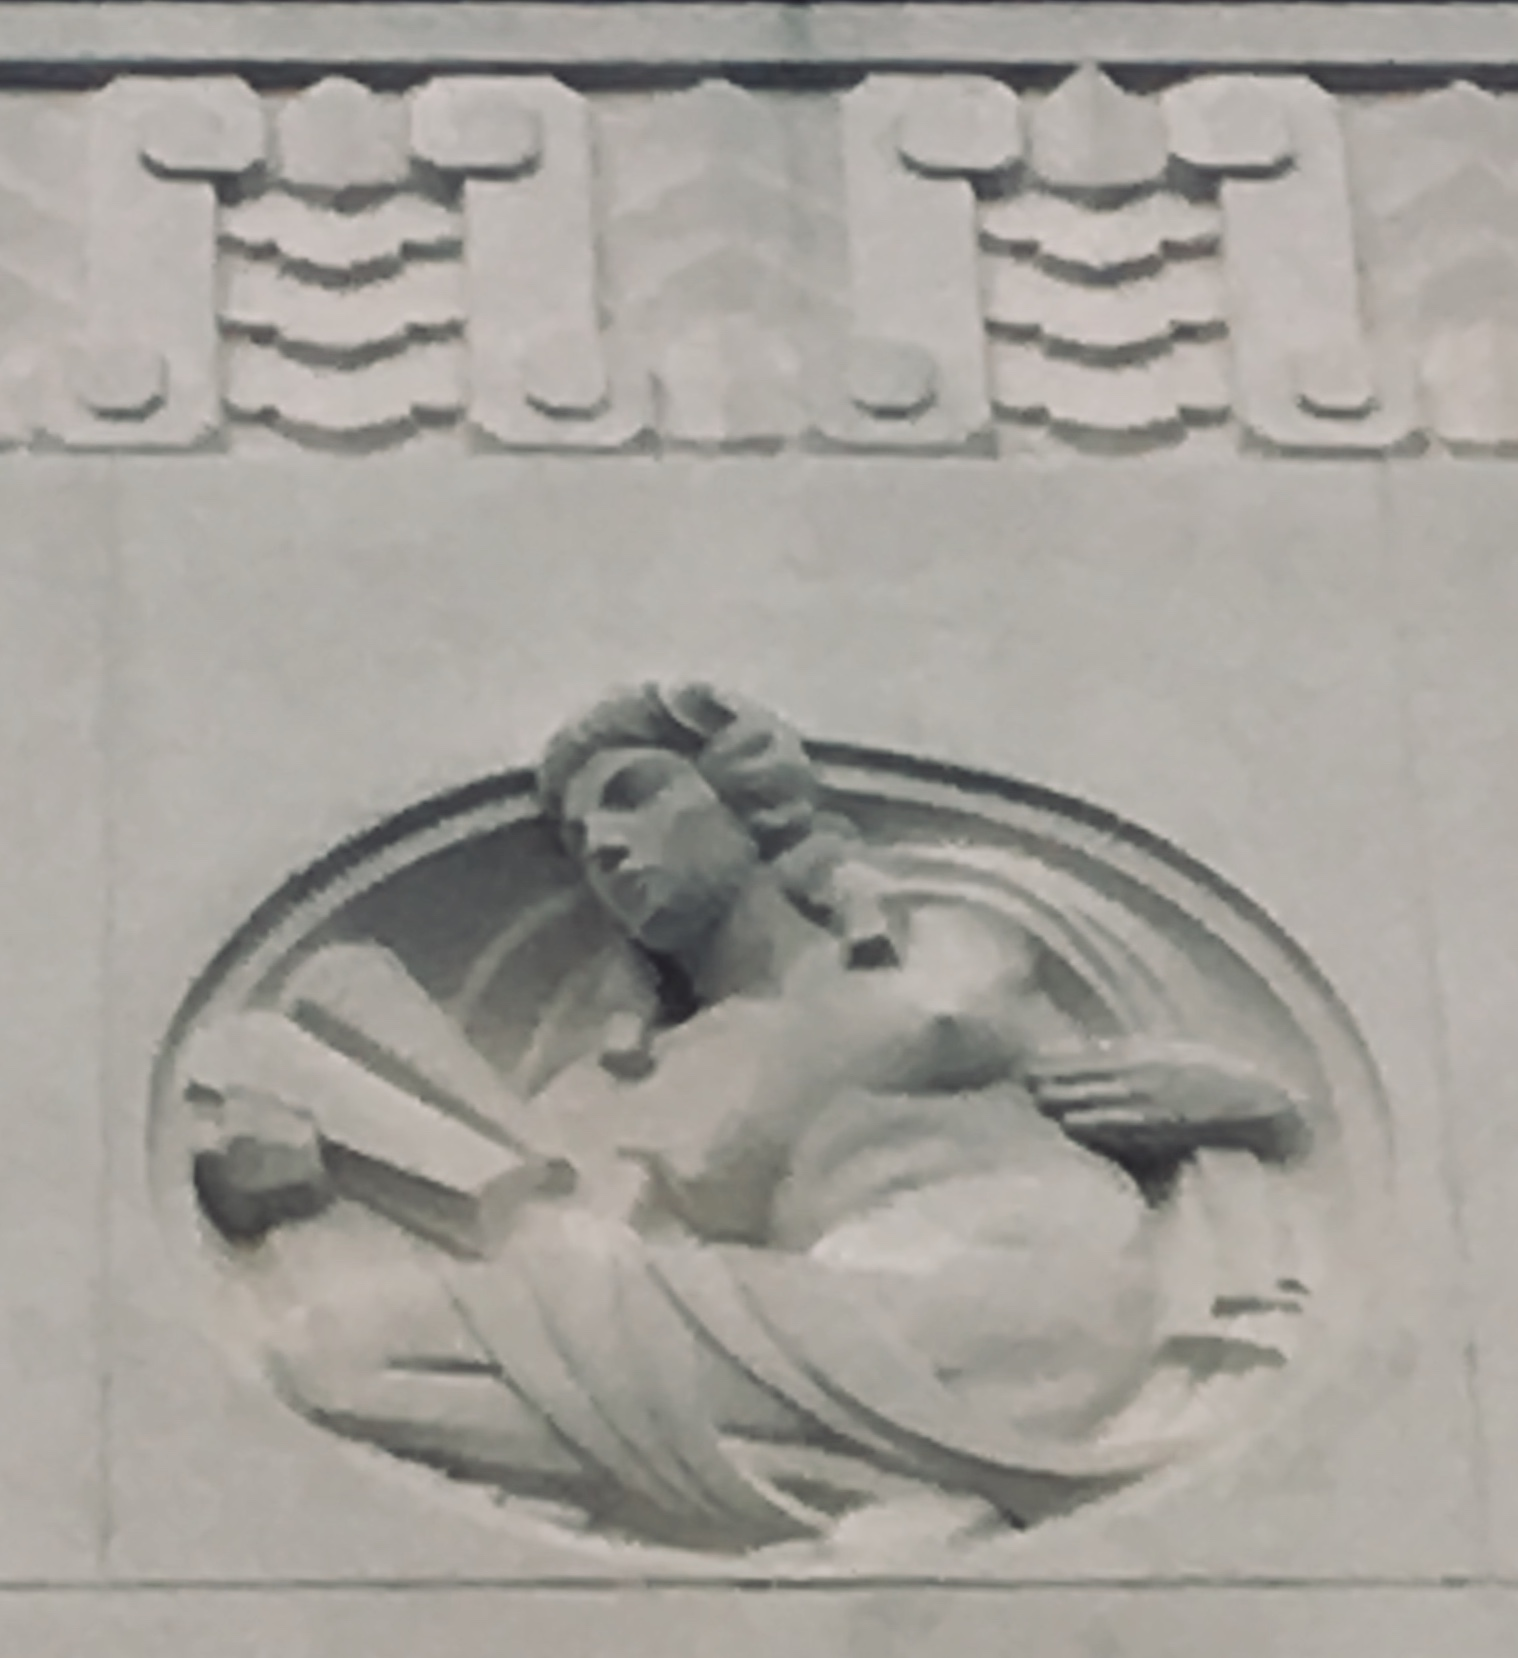 Marina Middle School, Art Deco, design, architecture, San Francisco